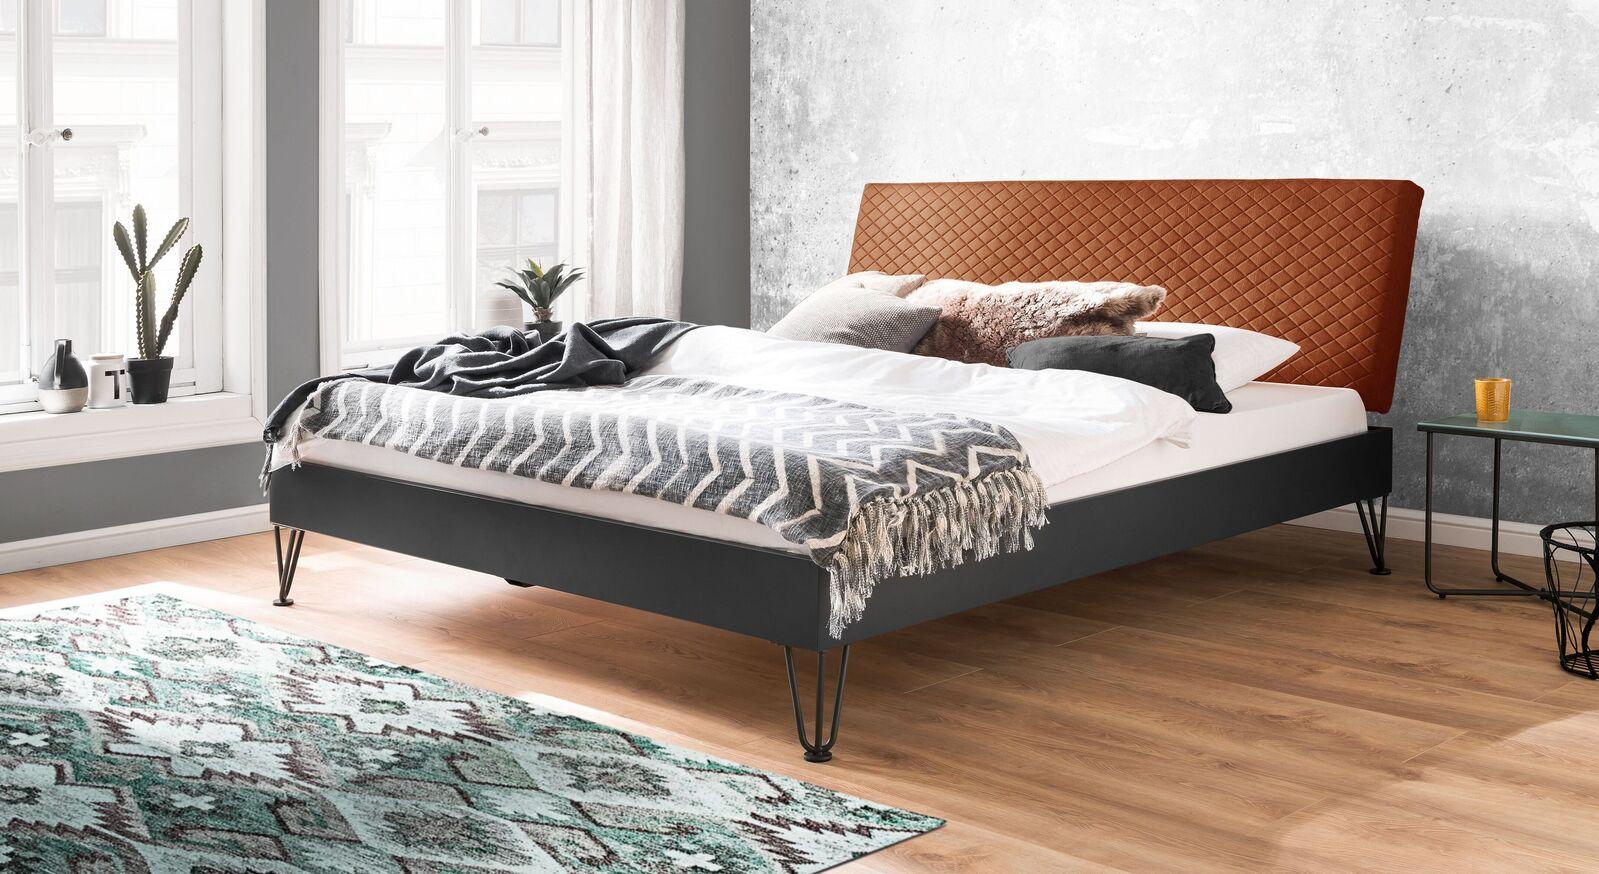 Modernes Bett Vegeta mit cognacfarbenem Kopfteil